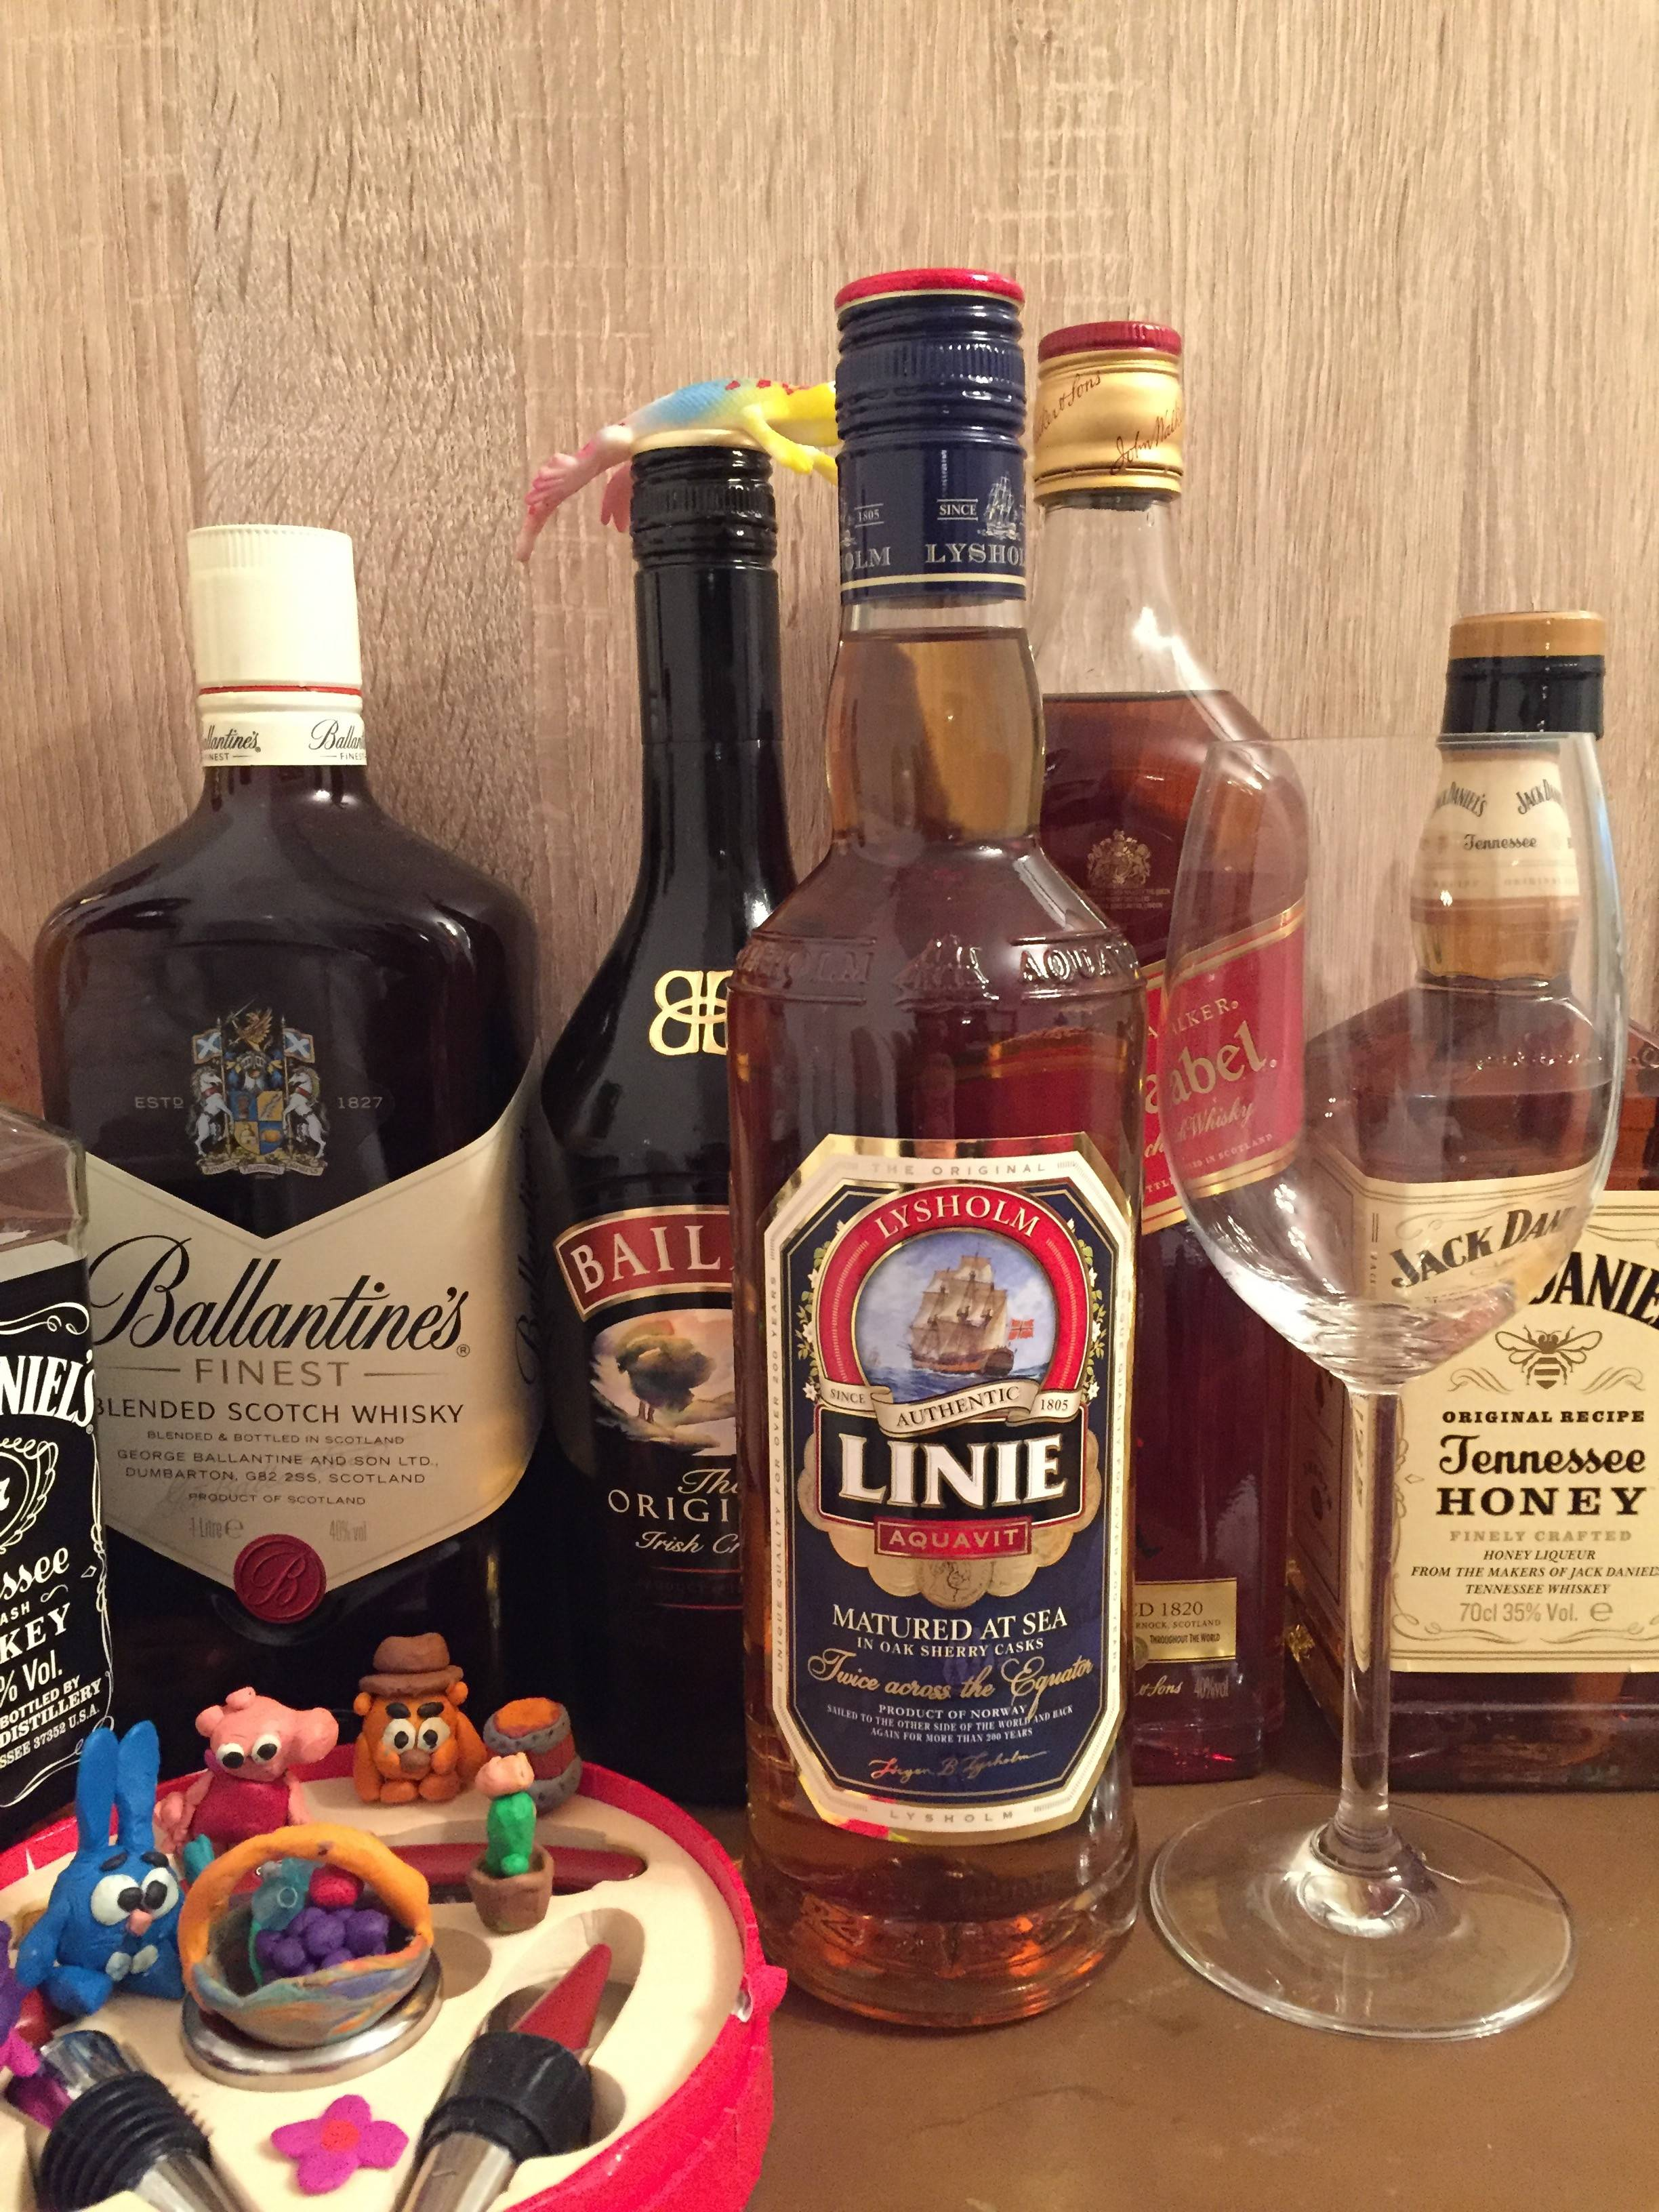 Виски джон корр (john corr): история, обзор вкуса и видов